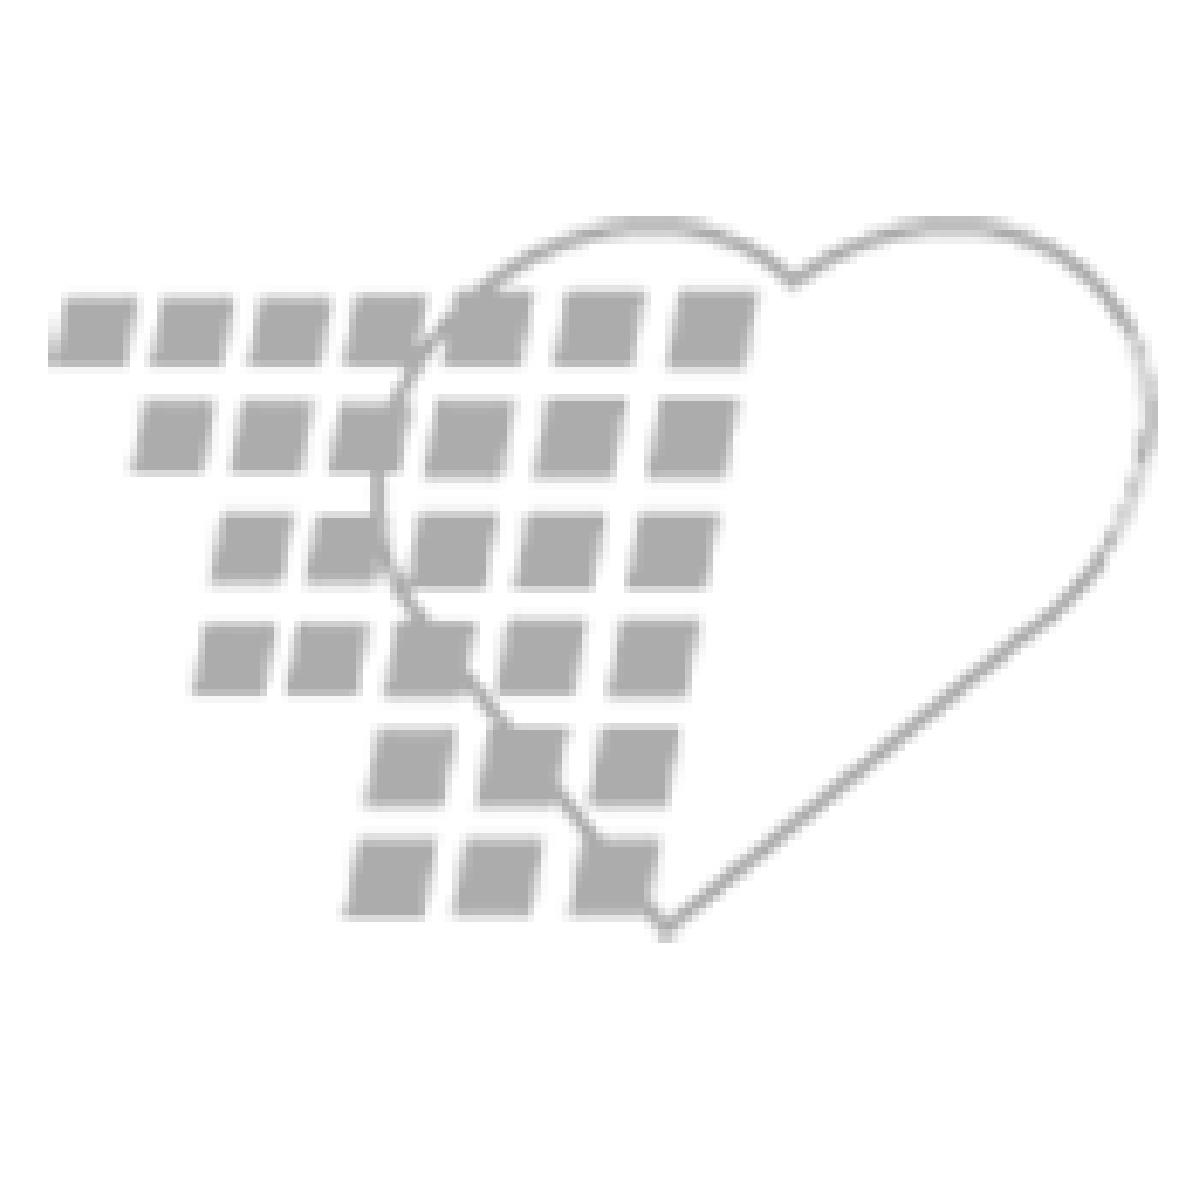 11-81-0004-BGELG - SimSleeves® - Large Right Beige